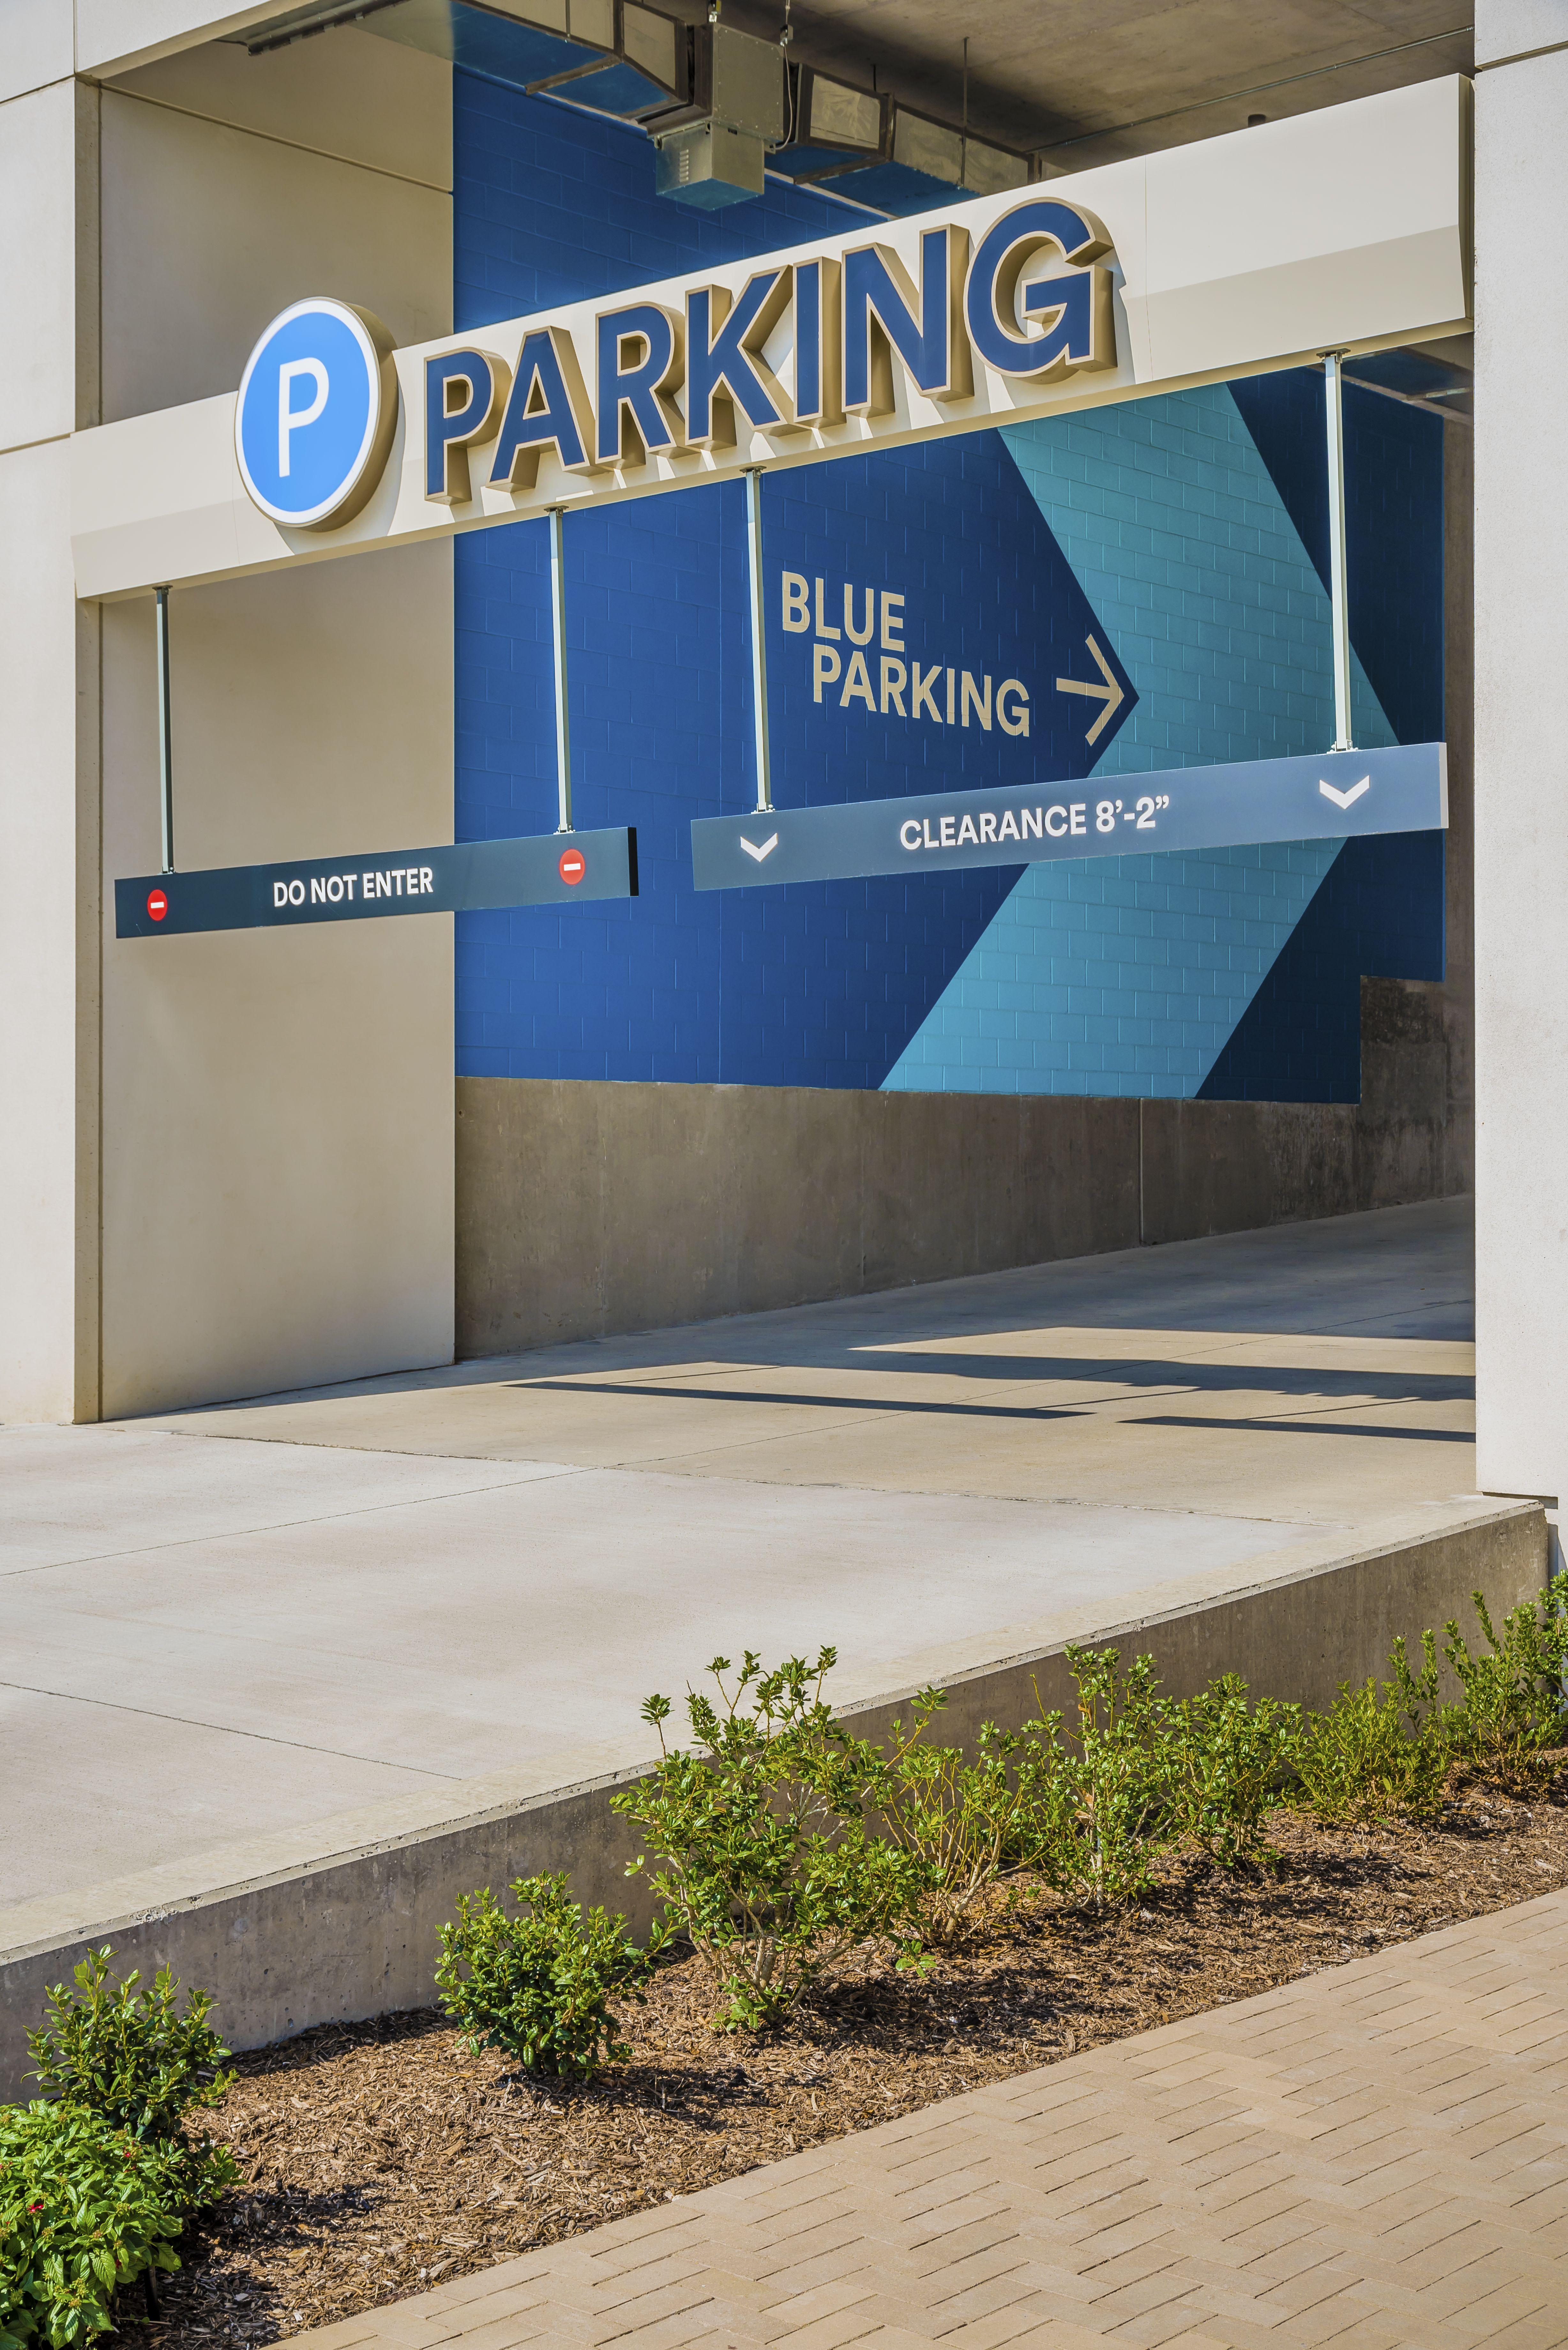 Placemaking Design Firm In Dallas Texas Signage Design Urban Design Concept Parking Design